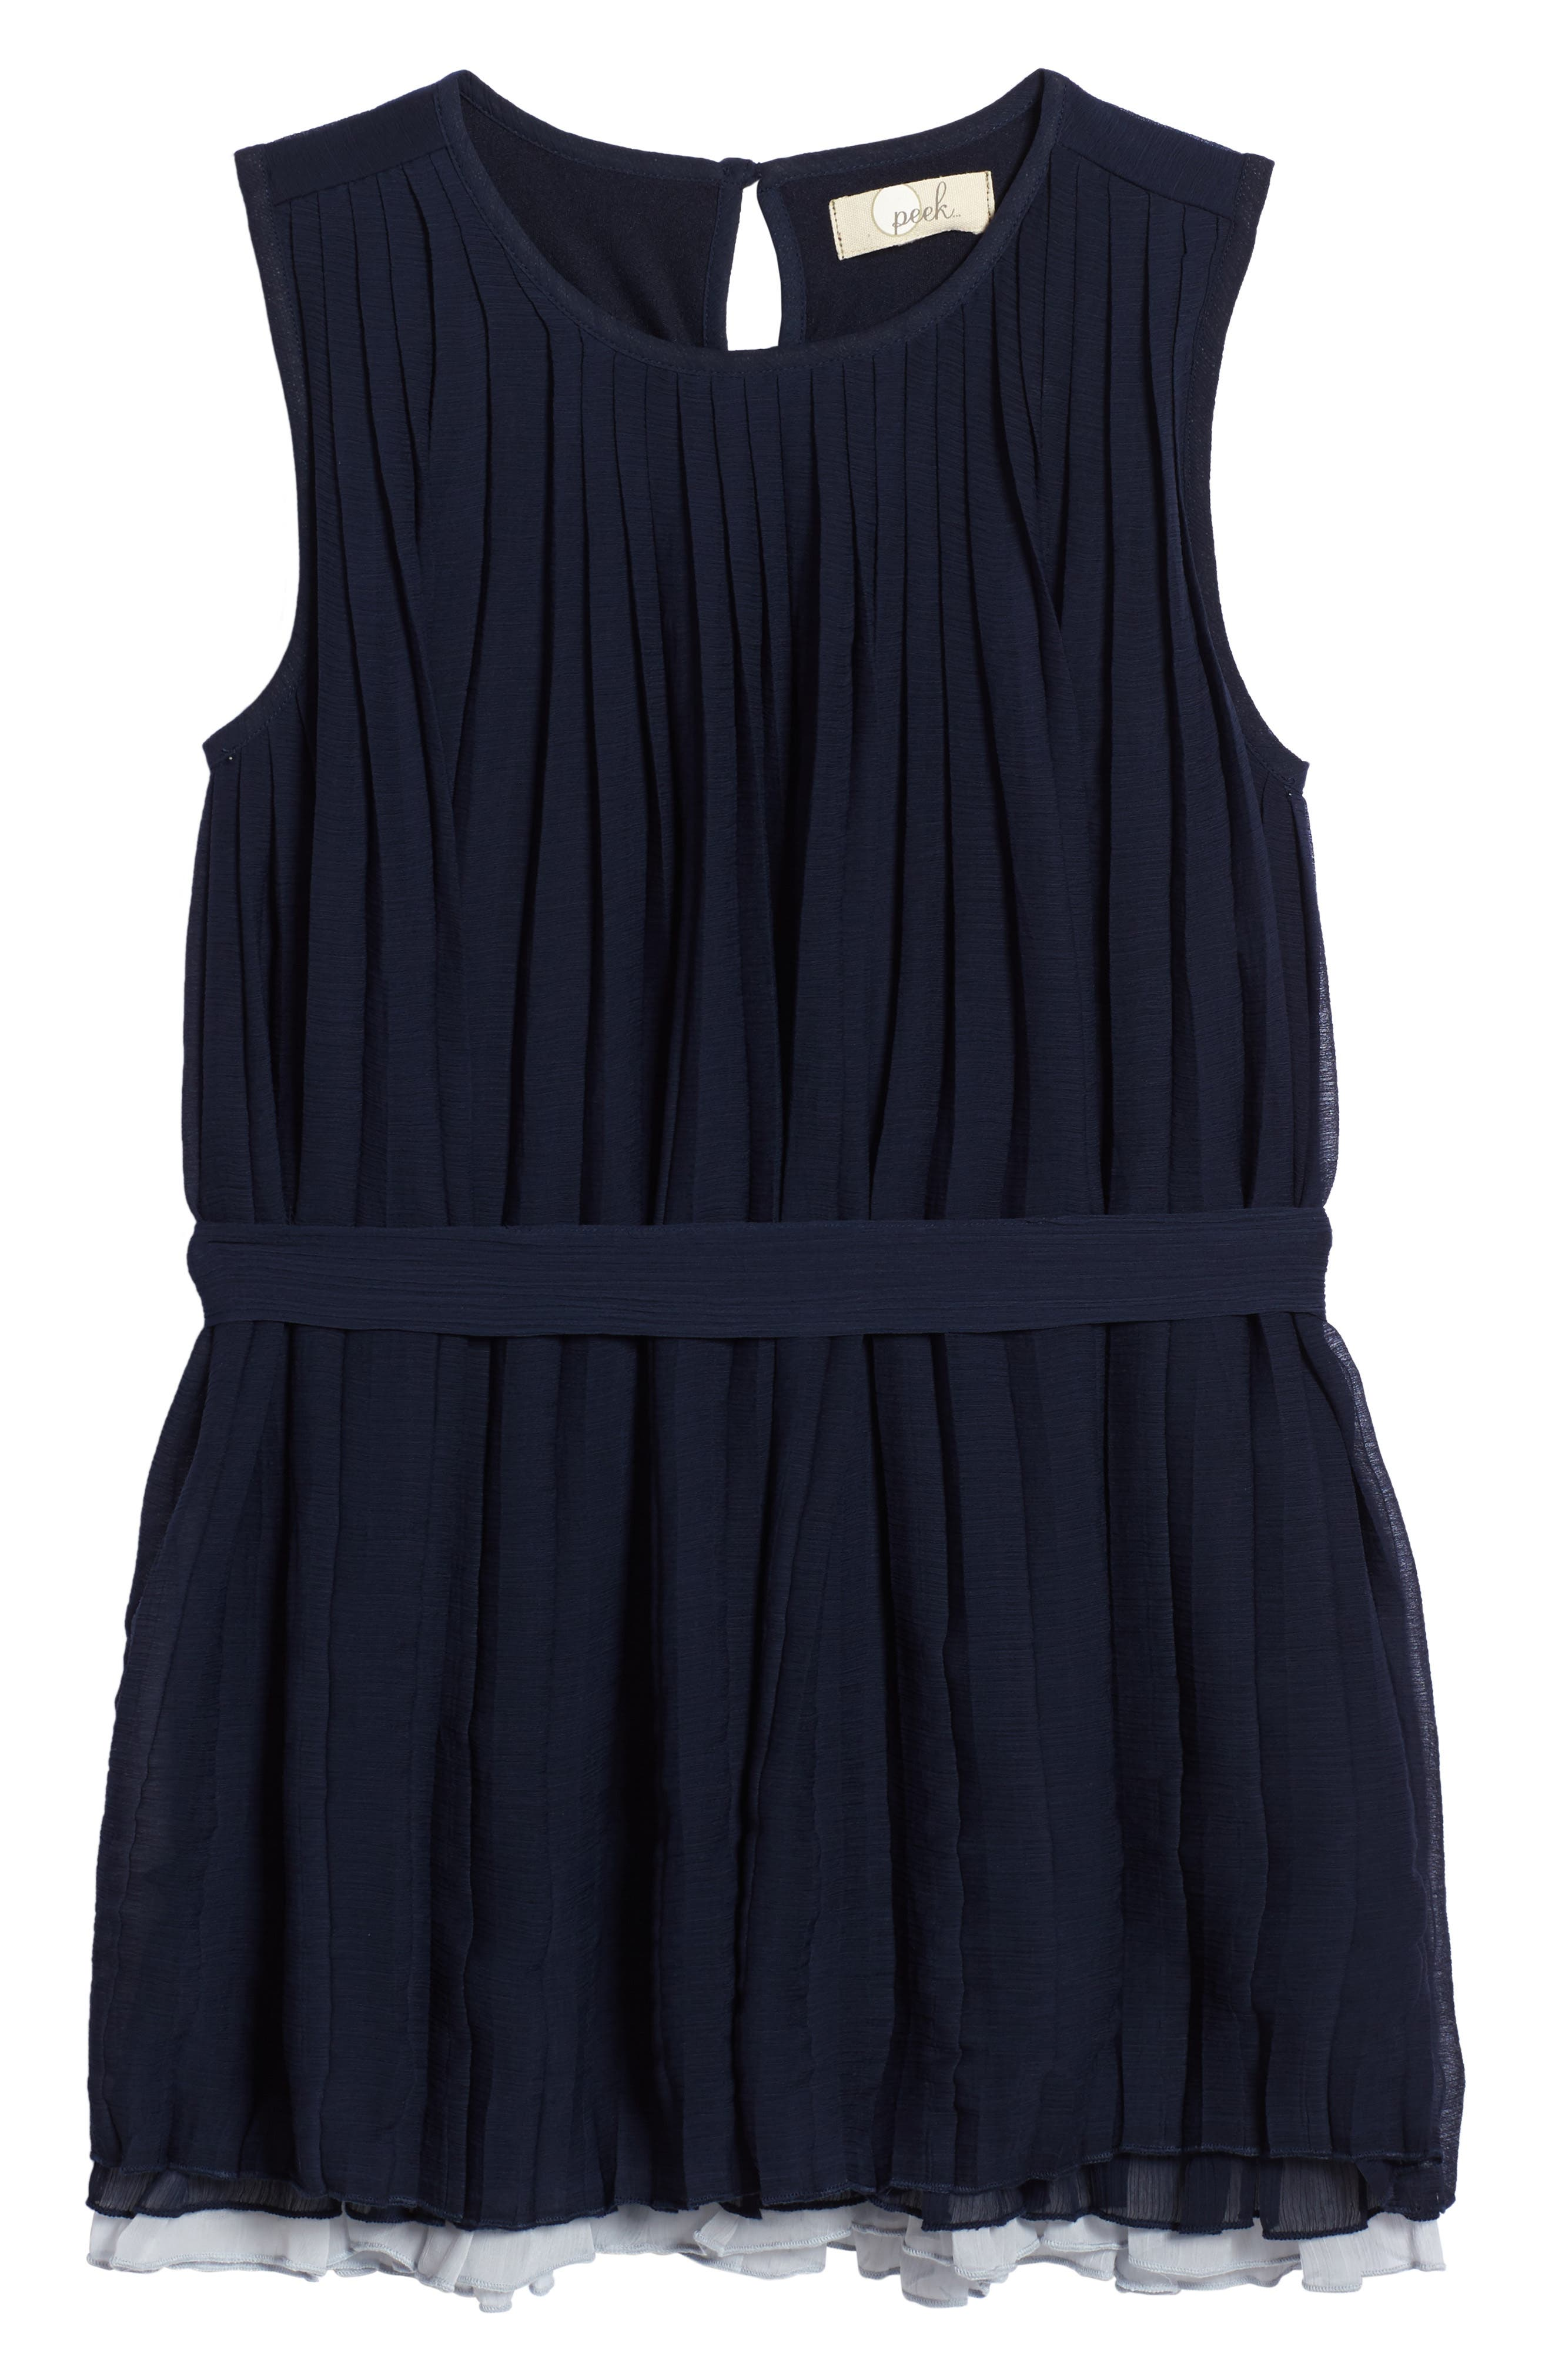 Main Image - Peek Stefanie Pleated Dress (Toddler Girls, Little Girls & Big Girls)